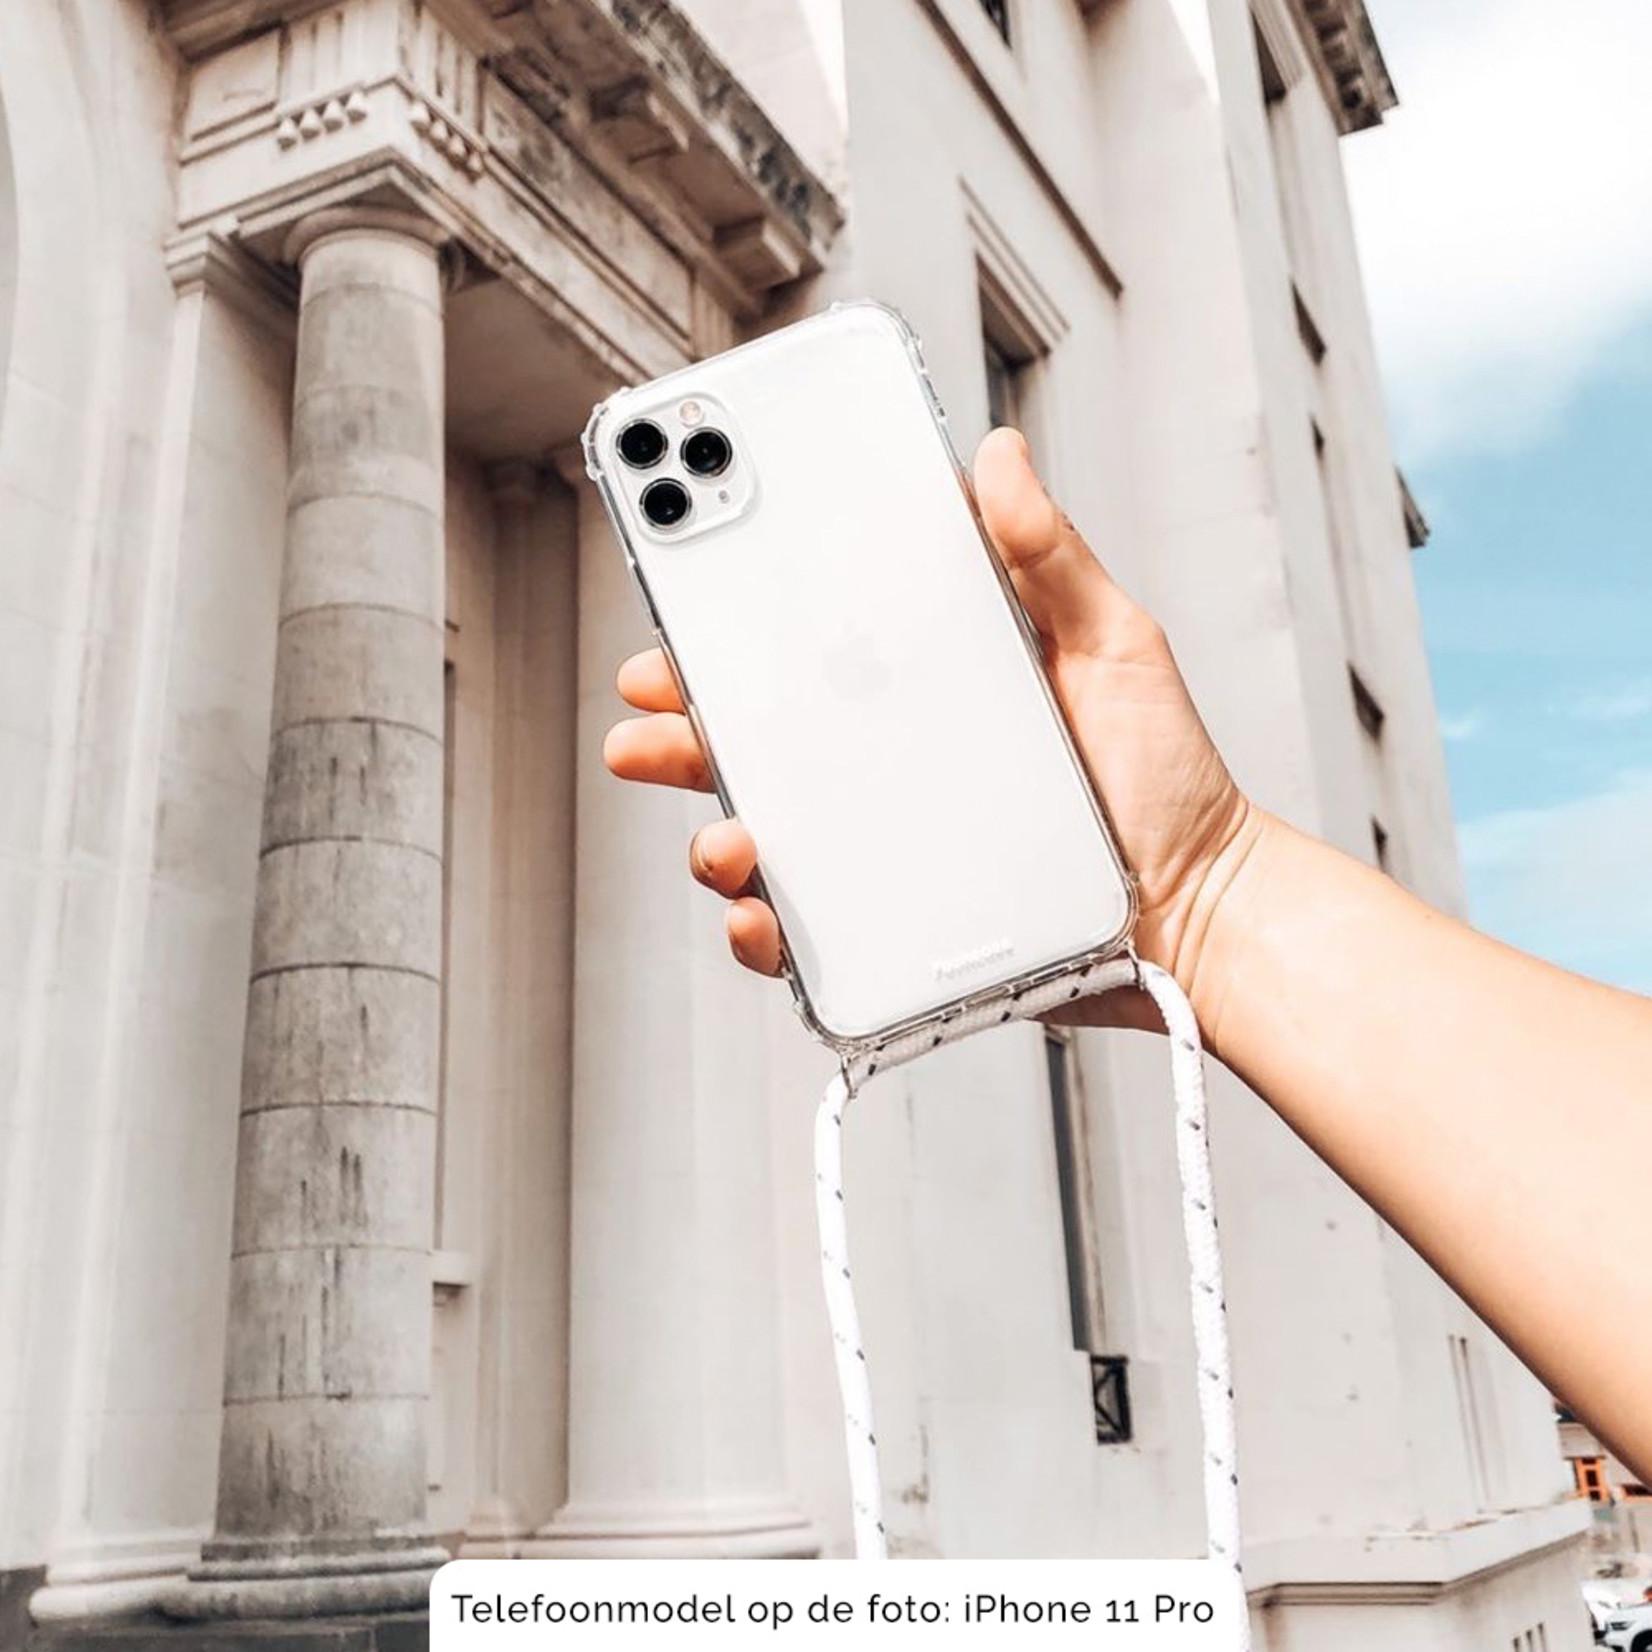 FOONCASE FESTICASE iPhone XS Max Telefoonhoesje met koord (Wit) TPU Soft Case - Transparant